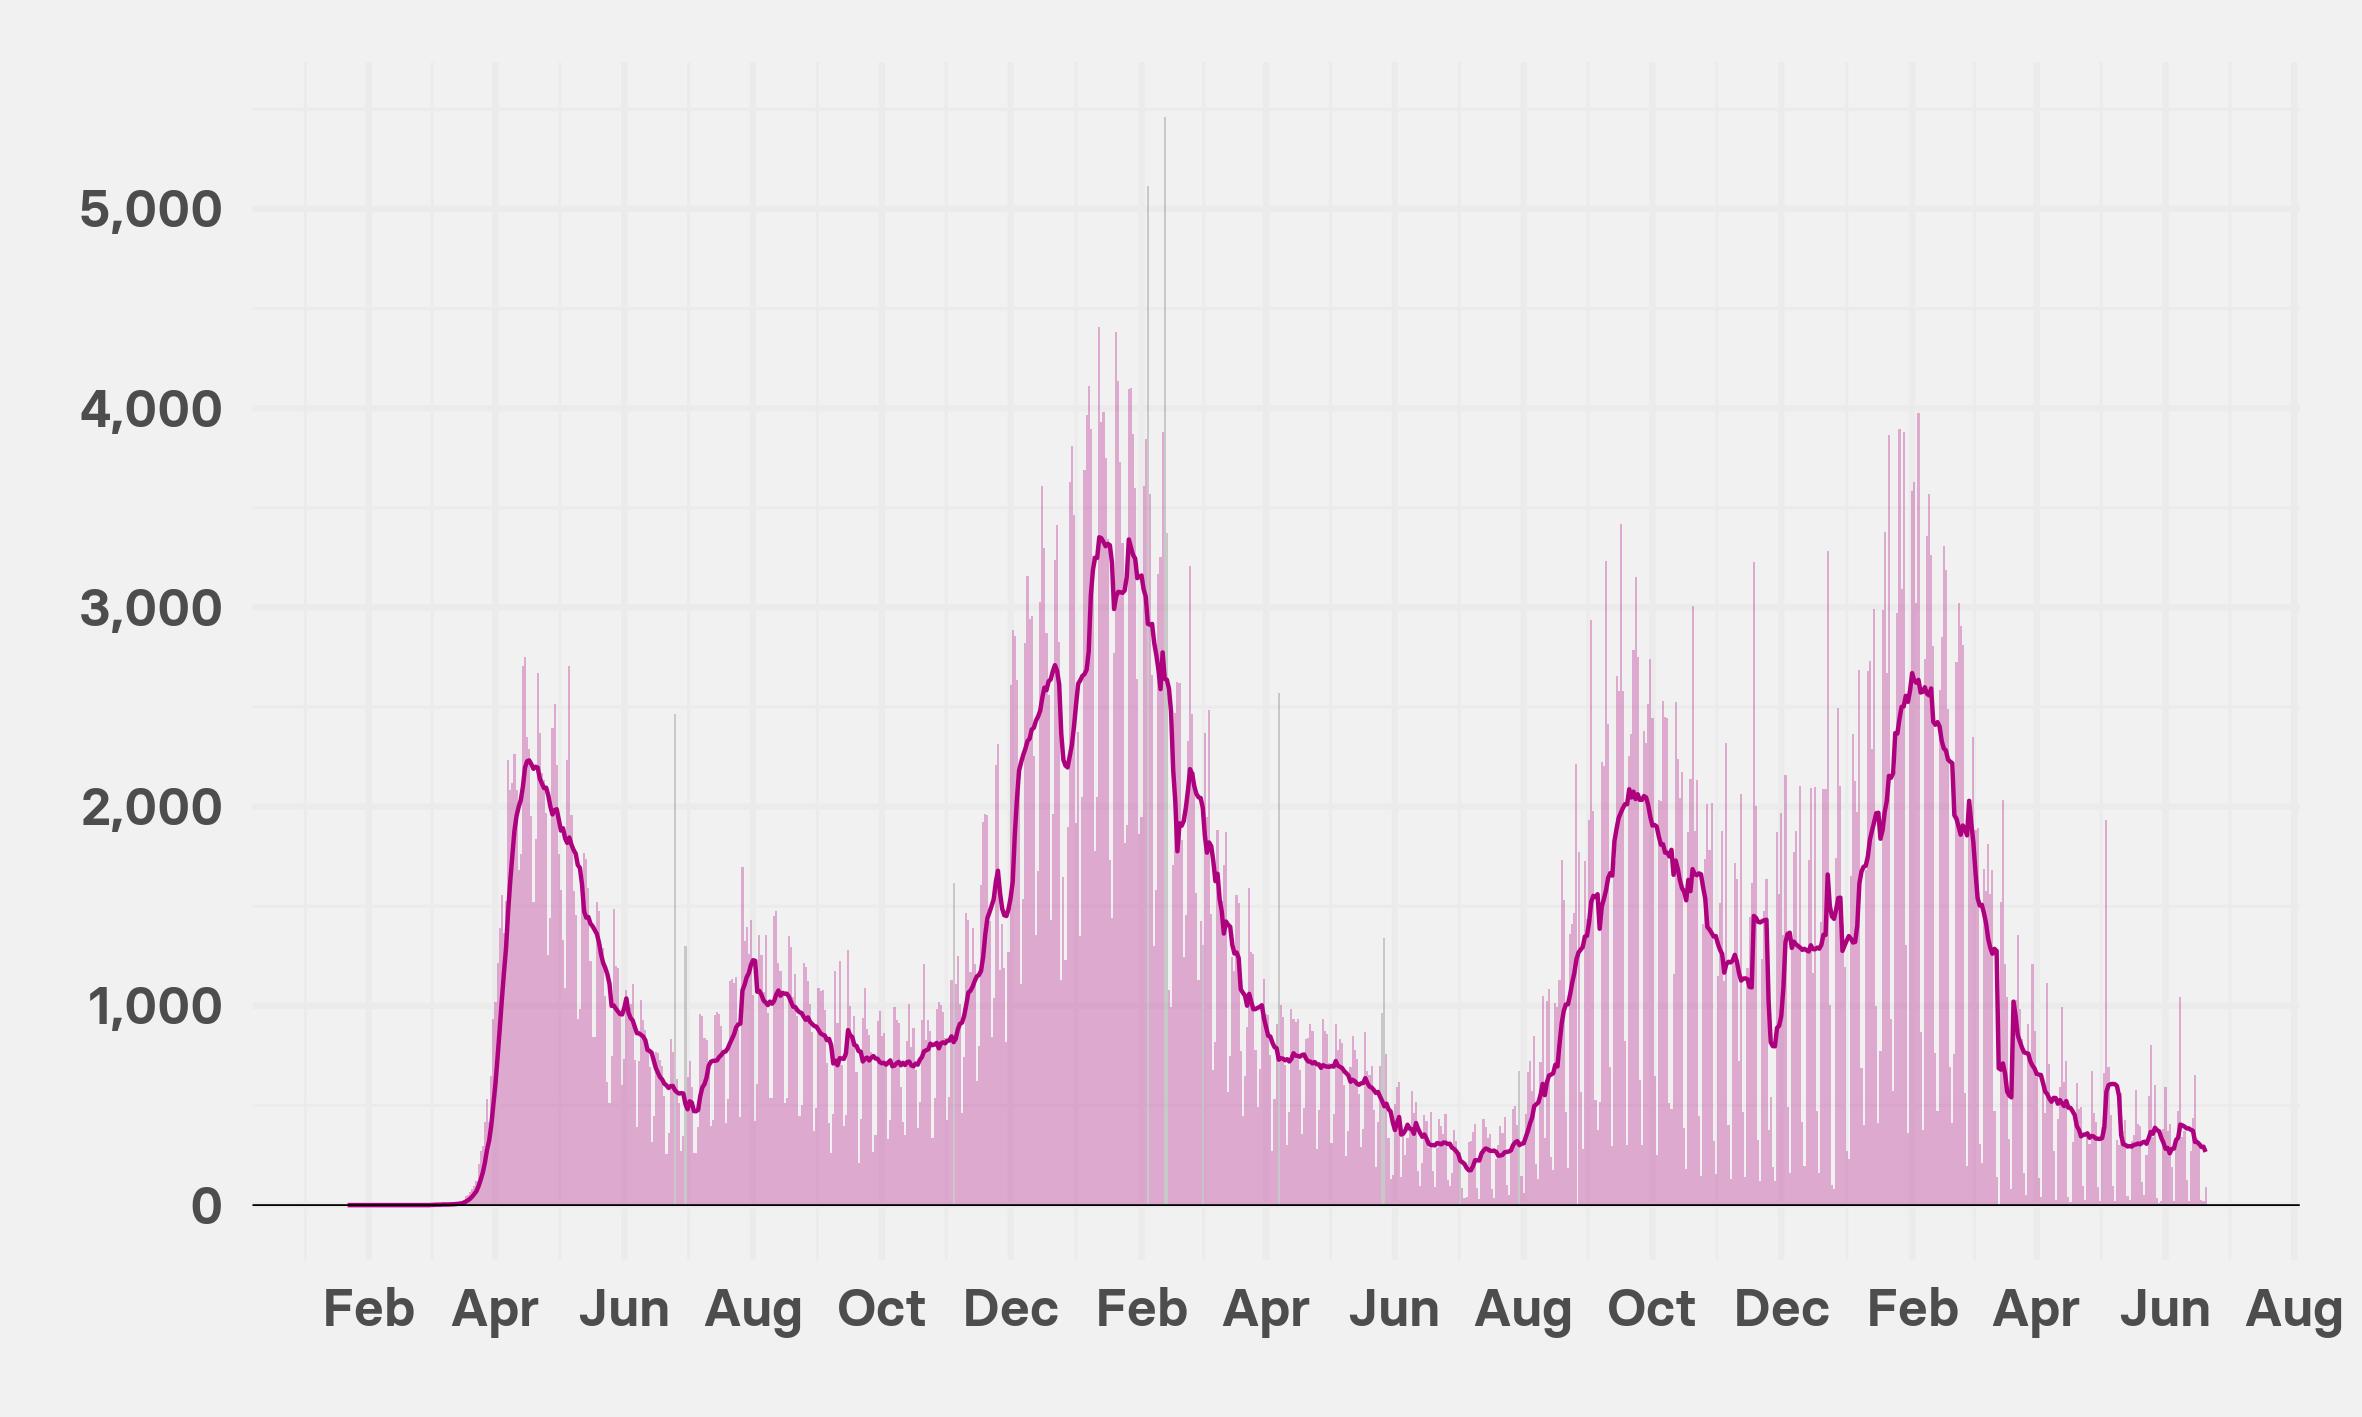 US COVID-19 deaths timeline